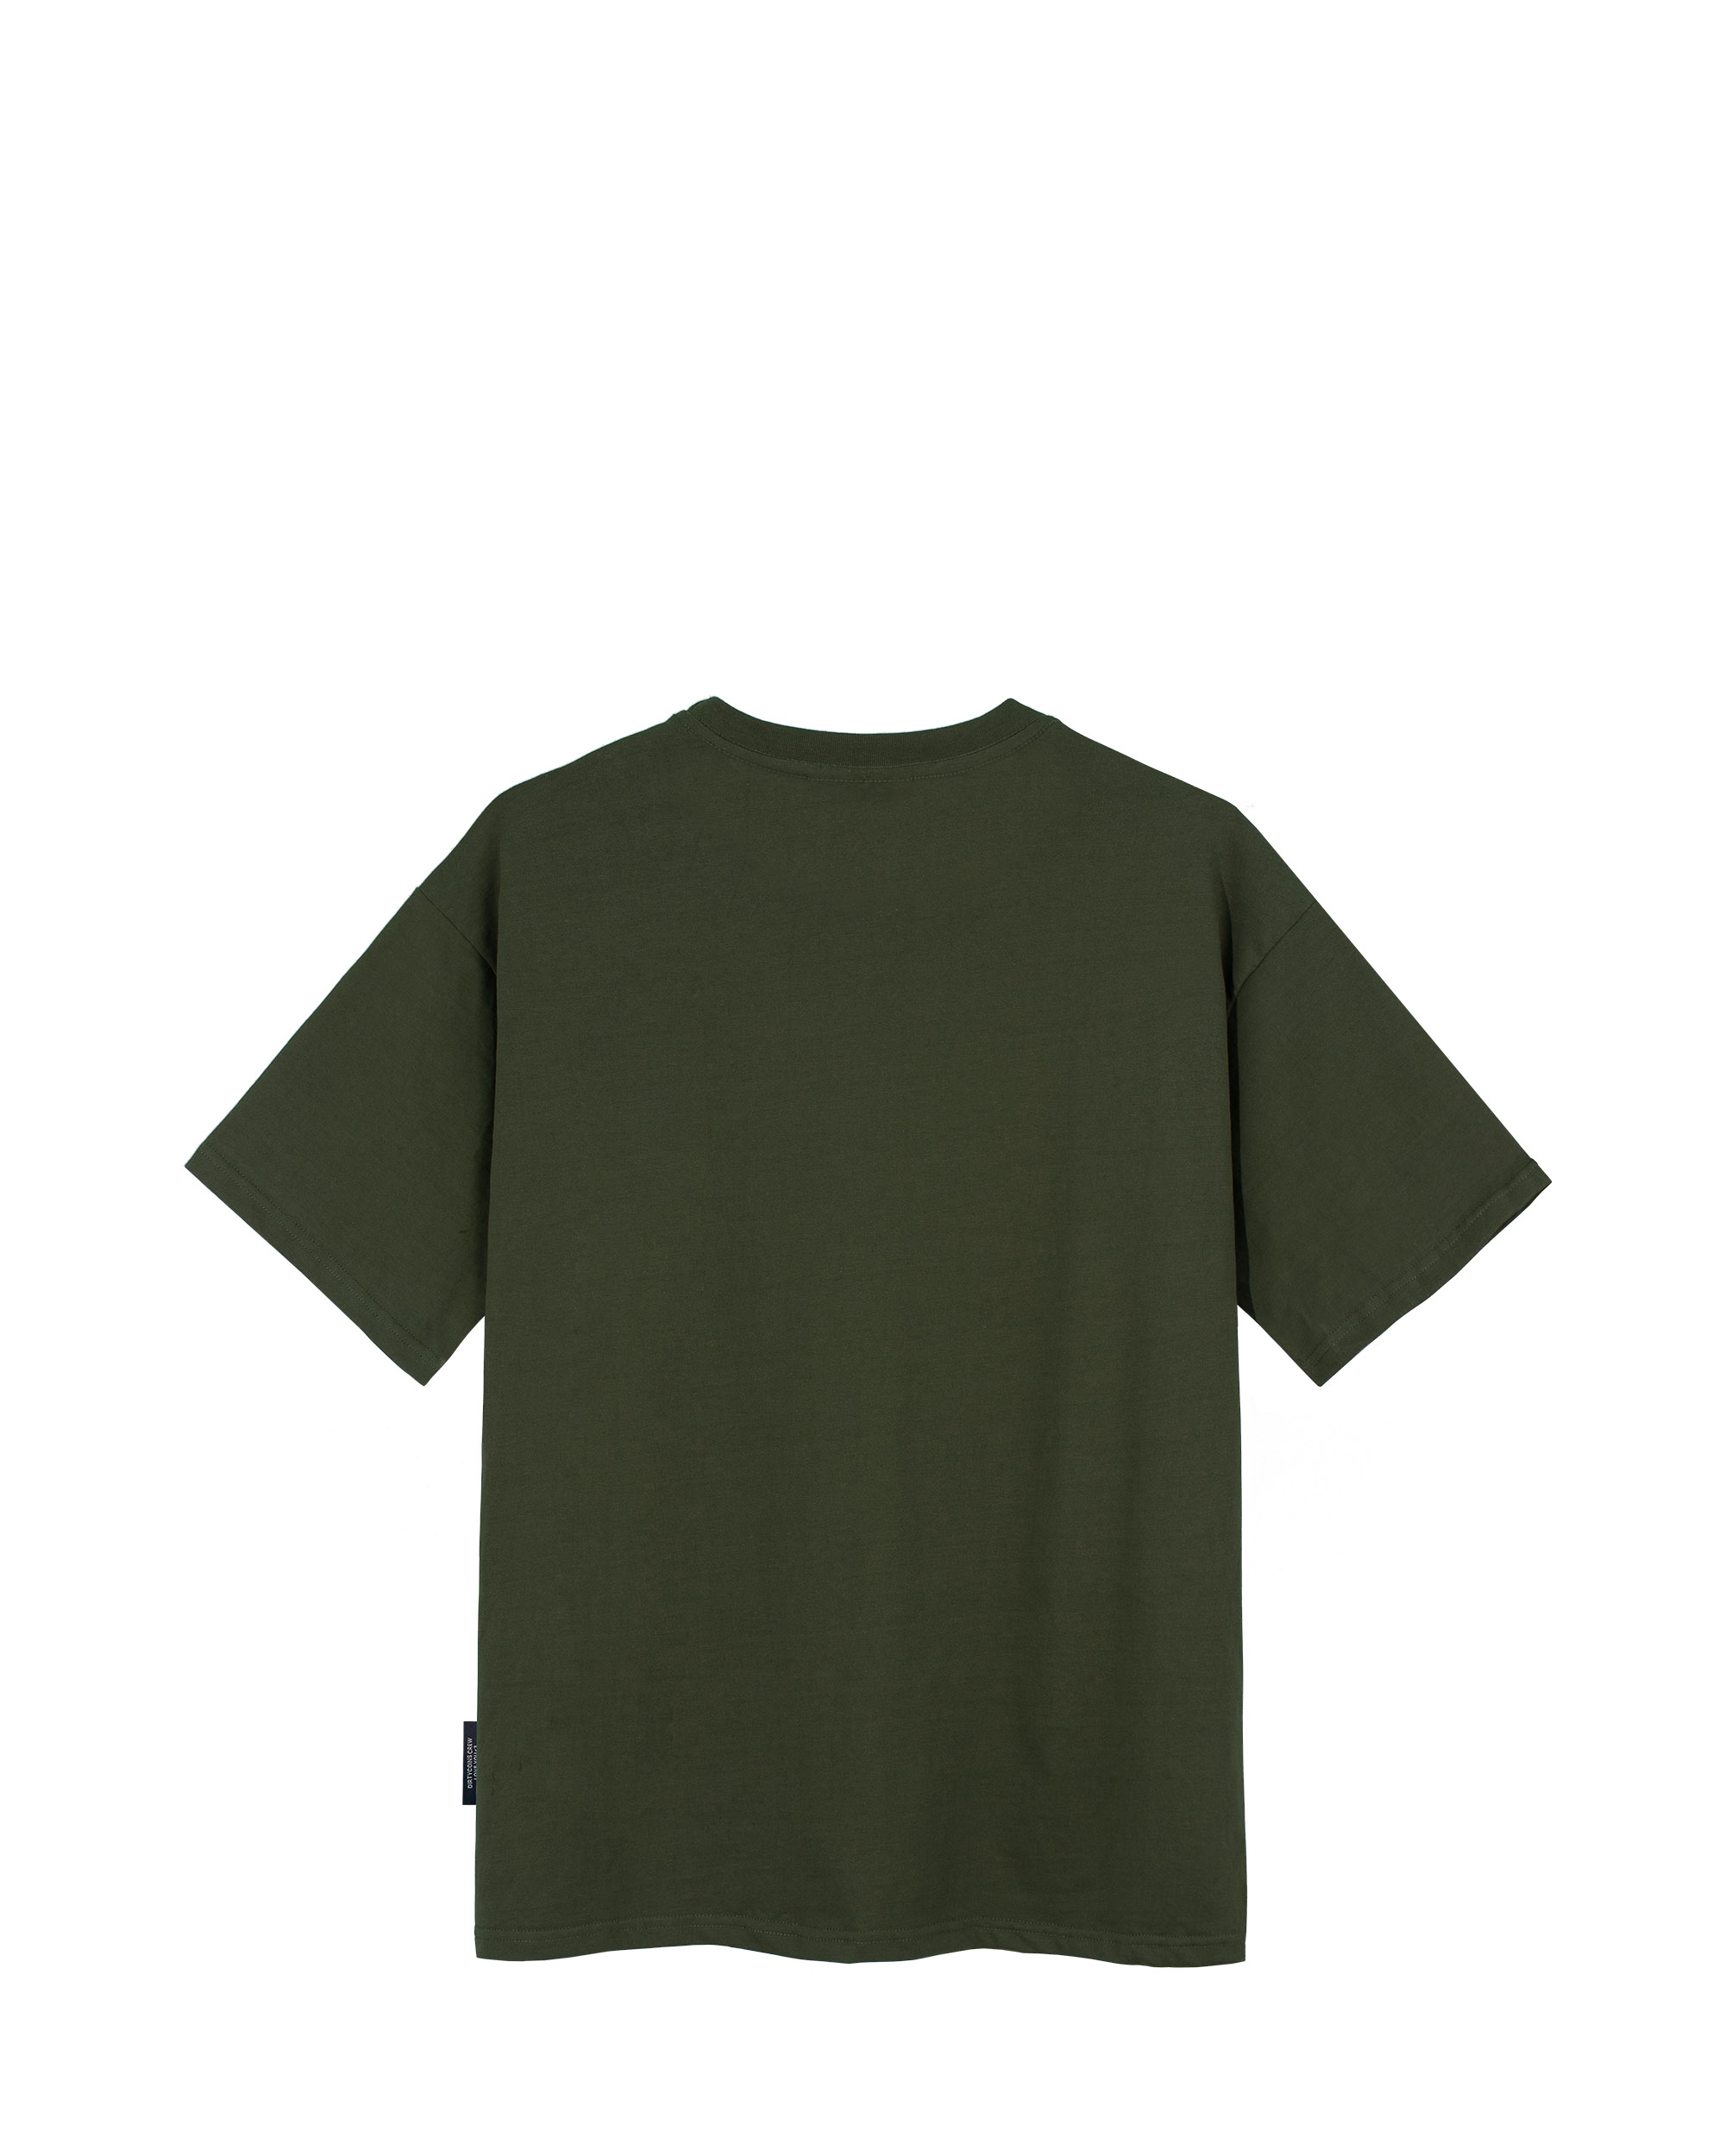 DirtyCoins Serif T-Shirt - Olive